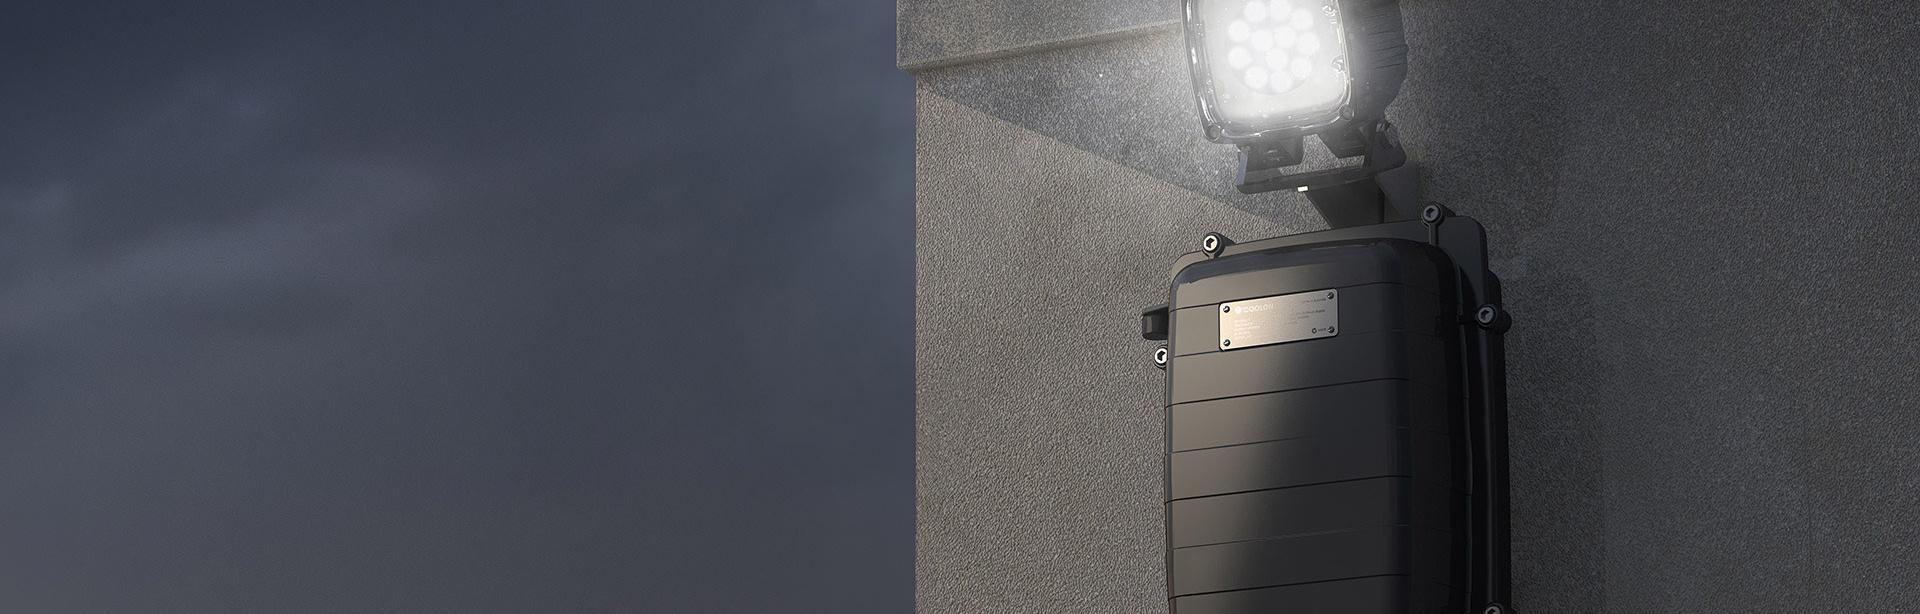 Enclosure and luminiare wall mount bracket.